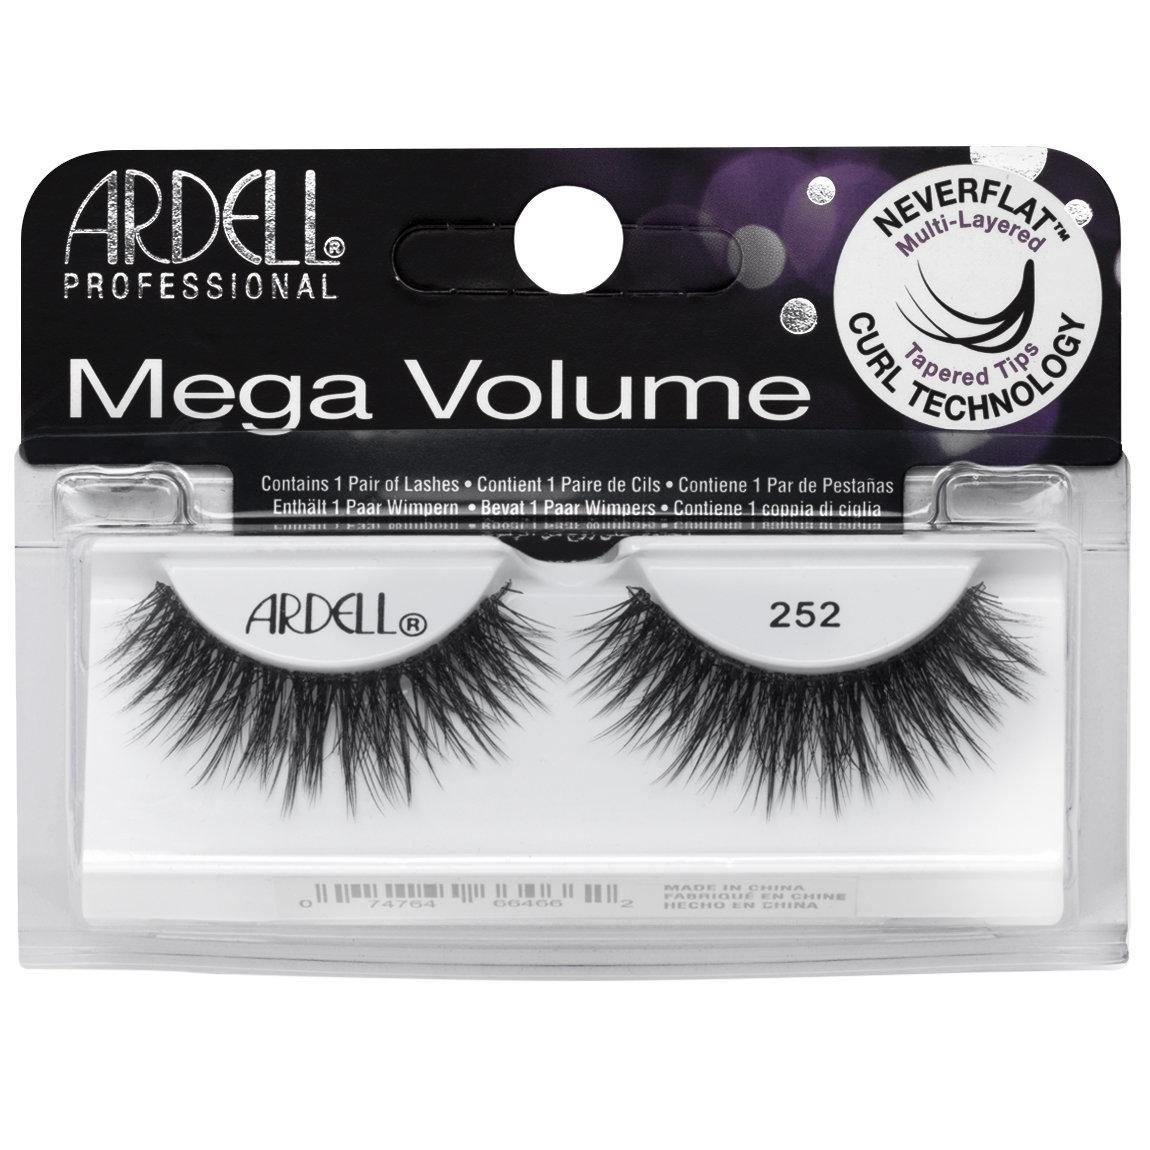 Ardell Mega Volume Lashes 252